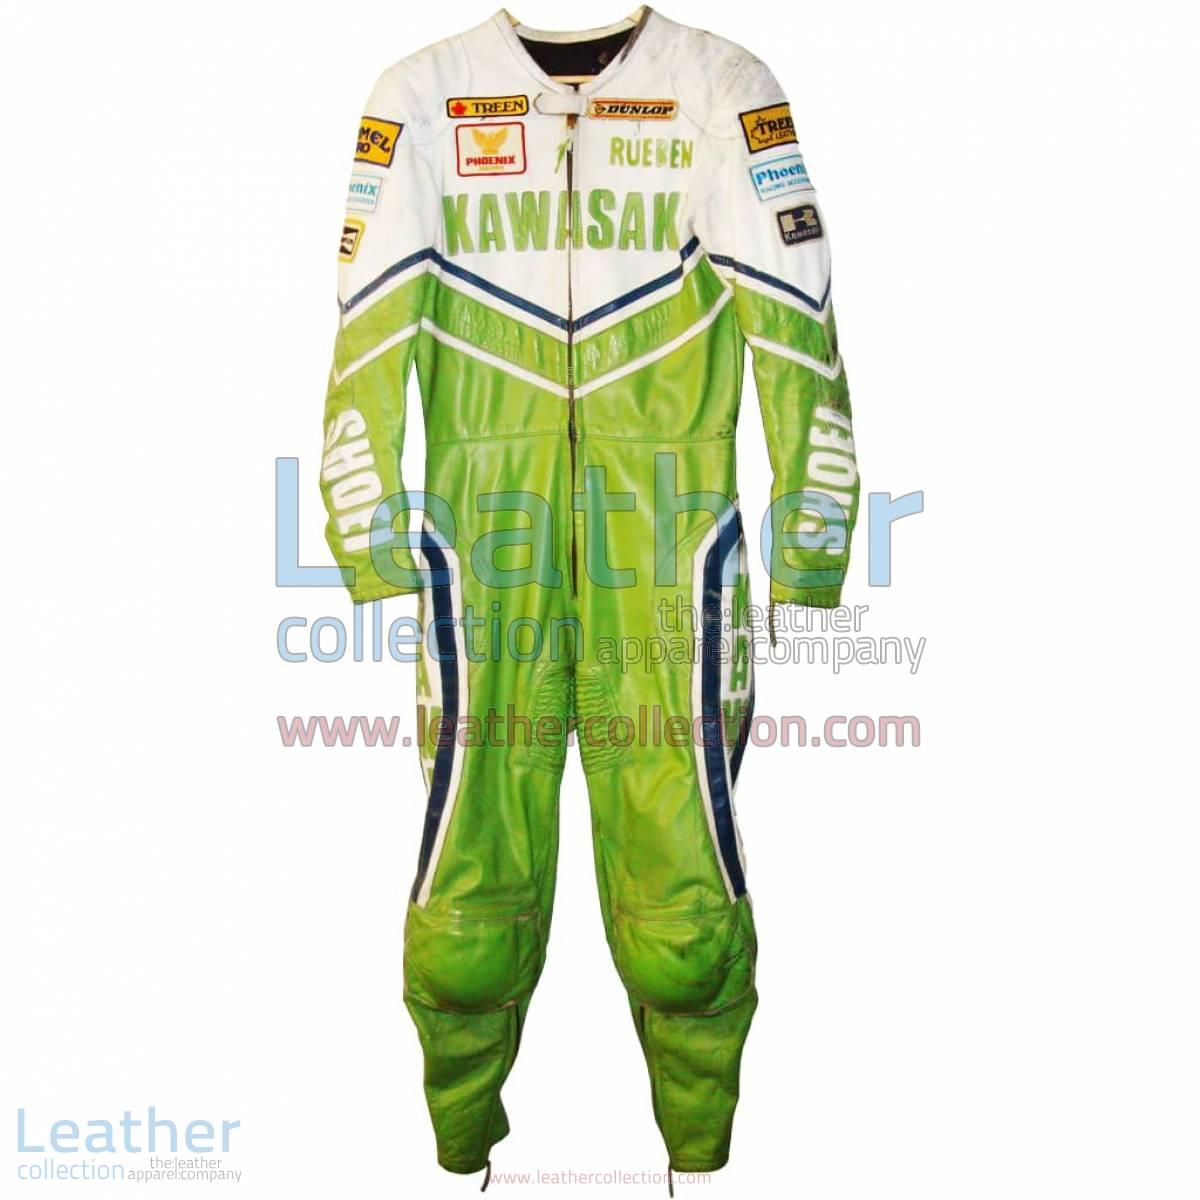 Rueben McMurter Canadian SBK Kawasaki Leathers | kawasaki clothing,kawasaki leathers